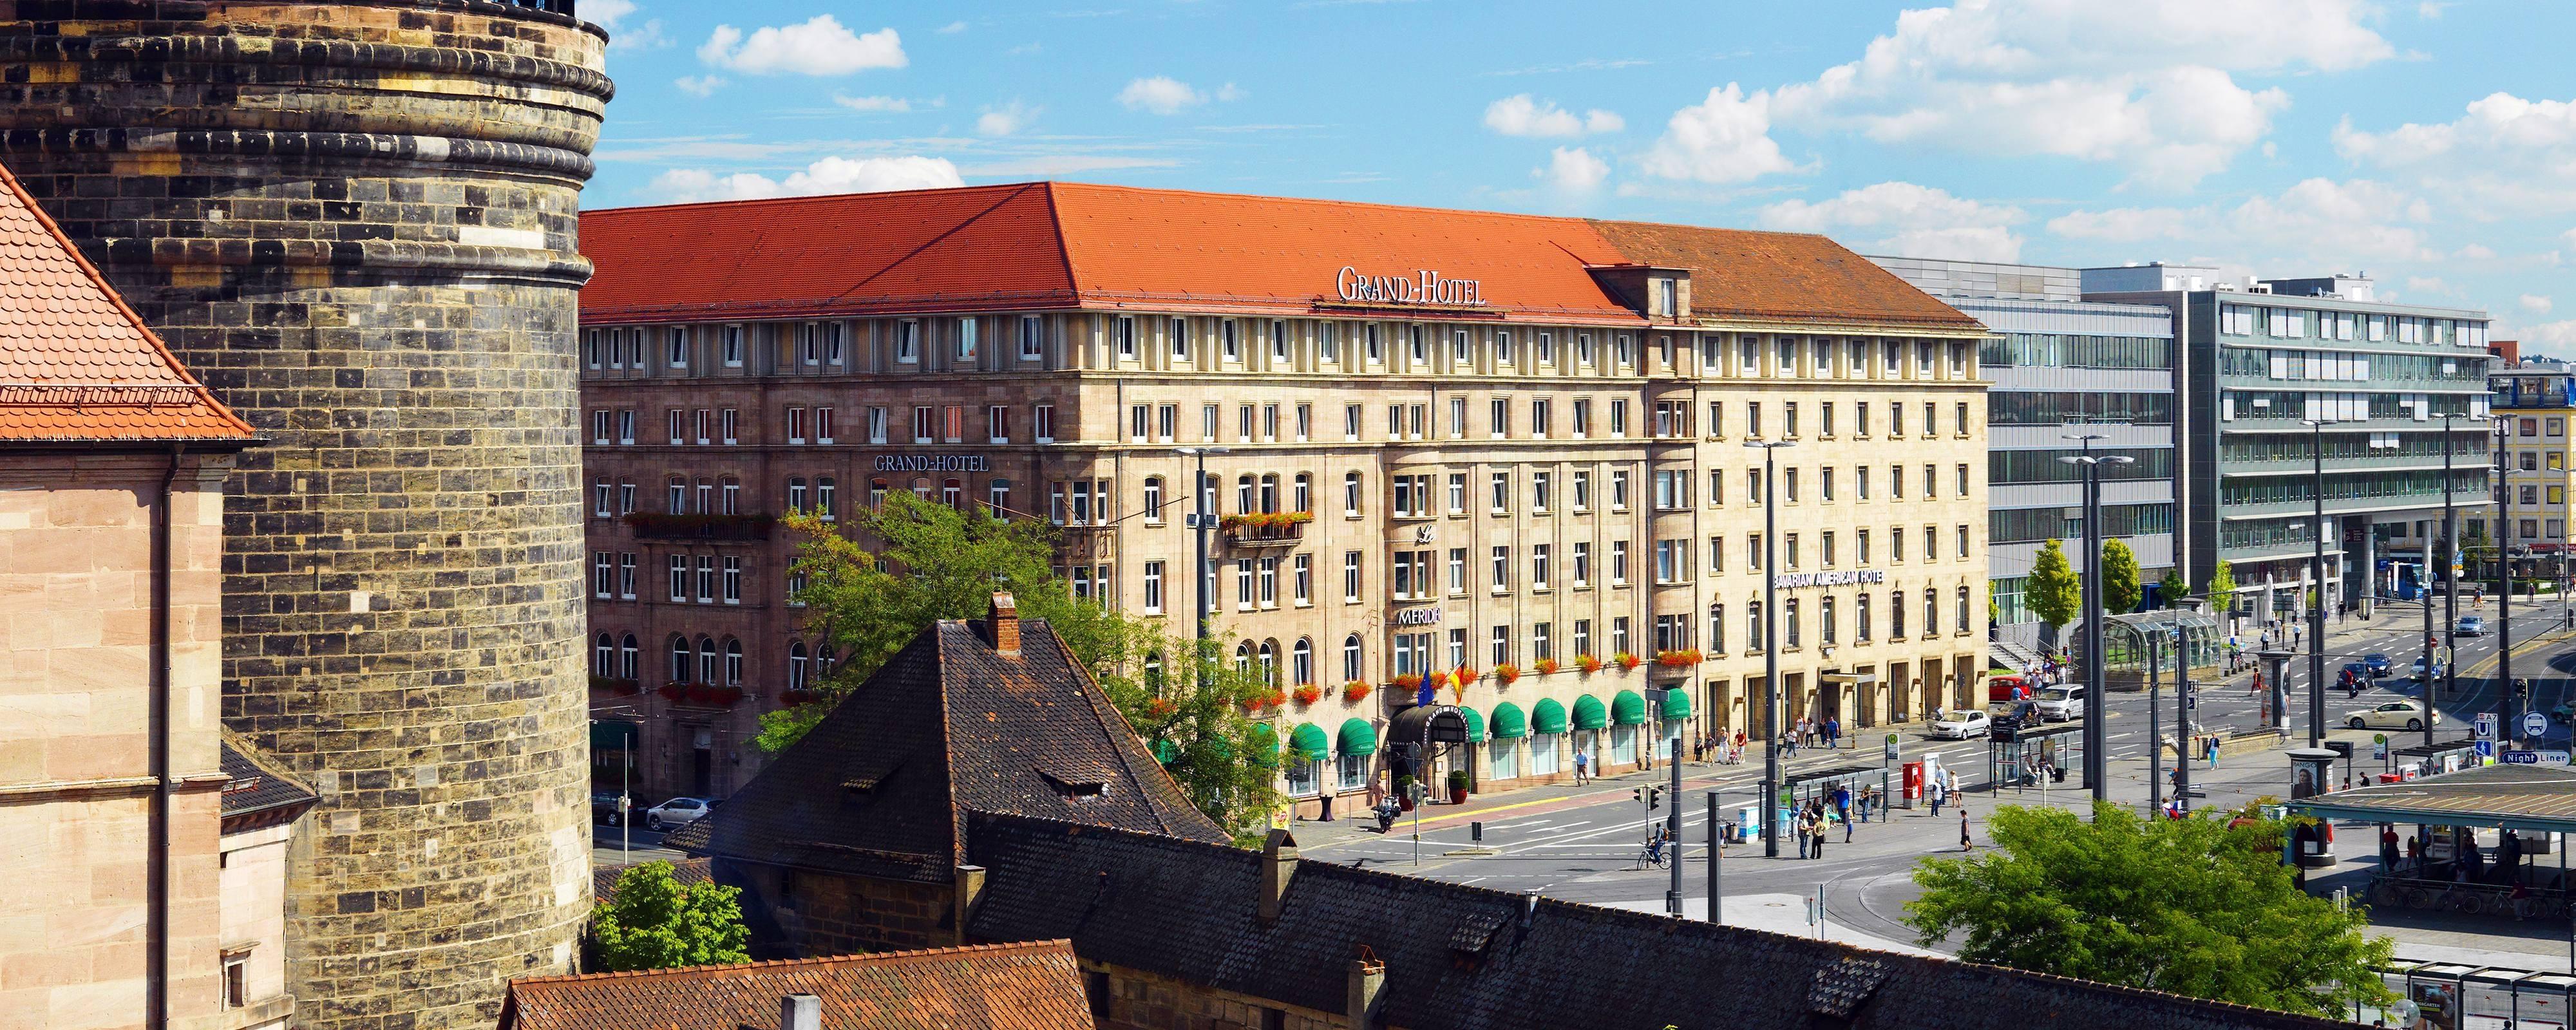 Esterno Le Meridien Grand, Norimberga